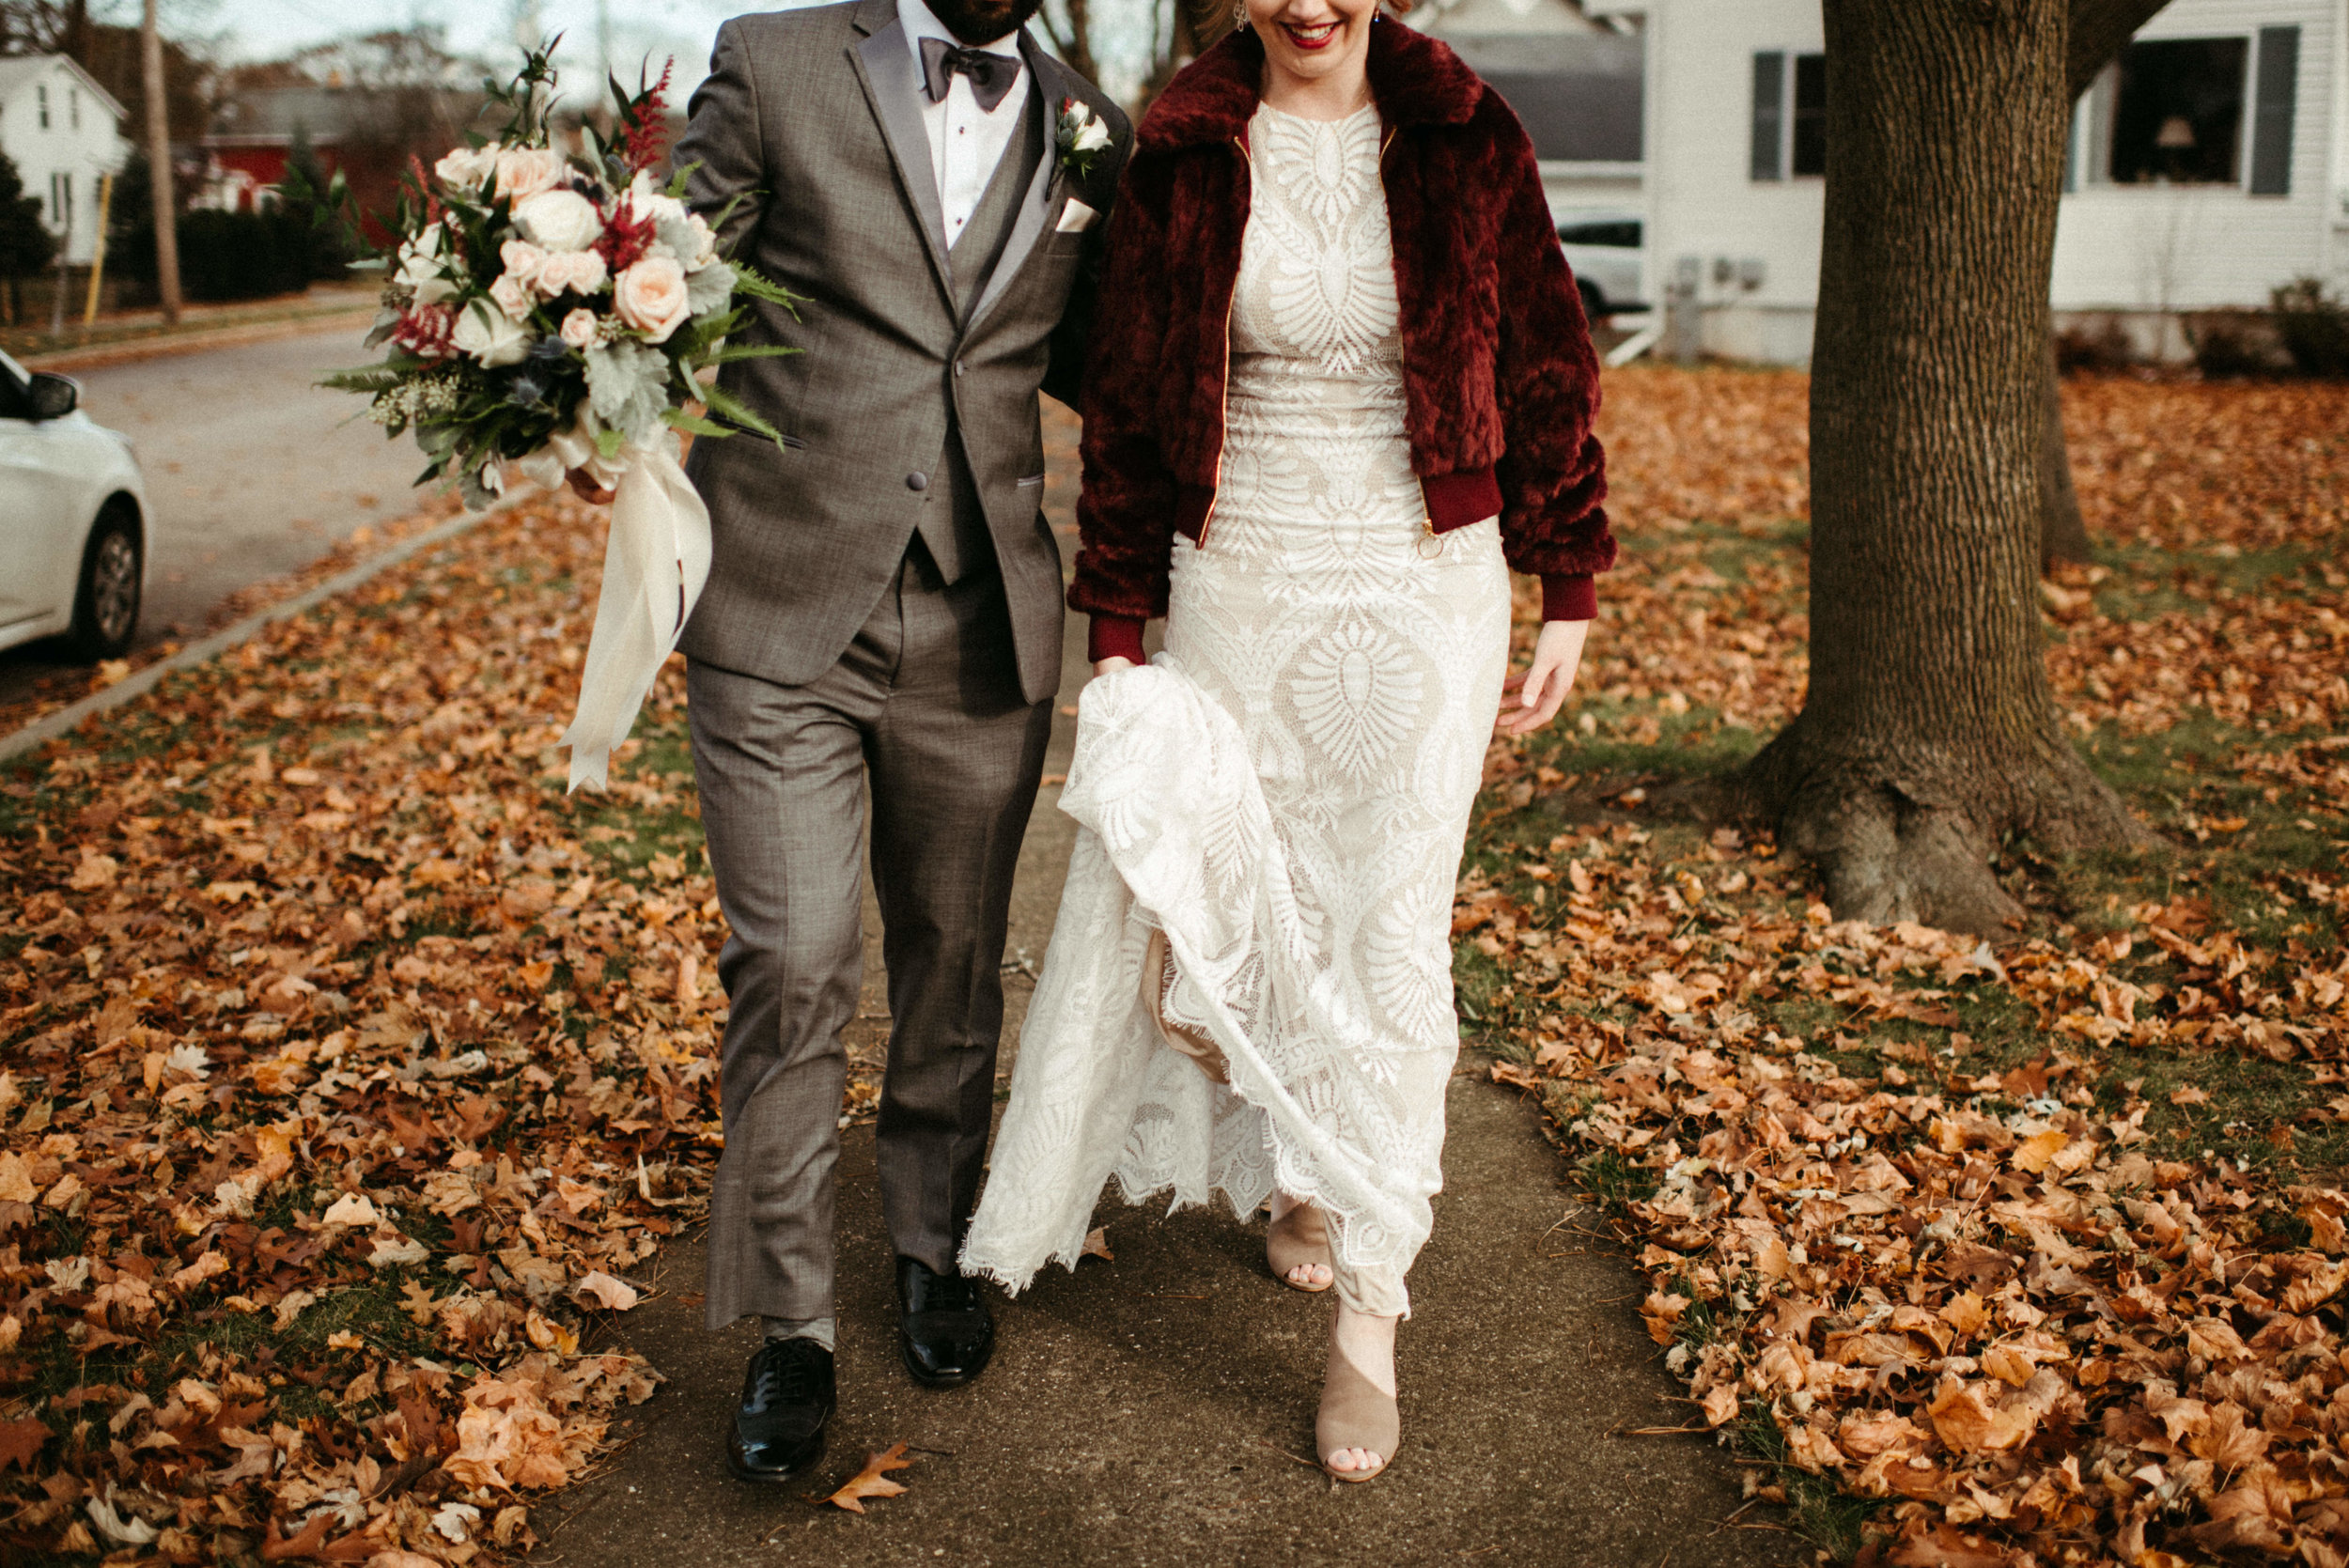 The Brix on Fox, Chicago Wedding Photographer, Zach and Rosalie00084.jpg